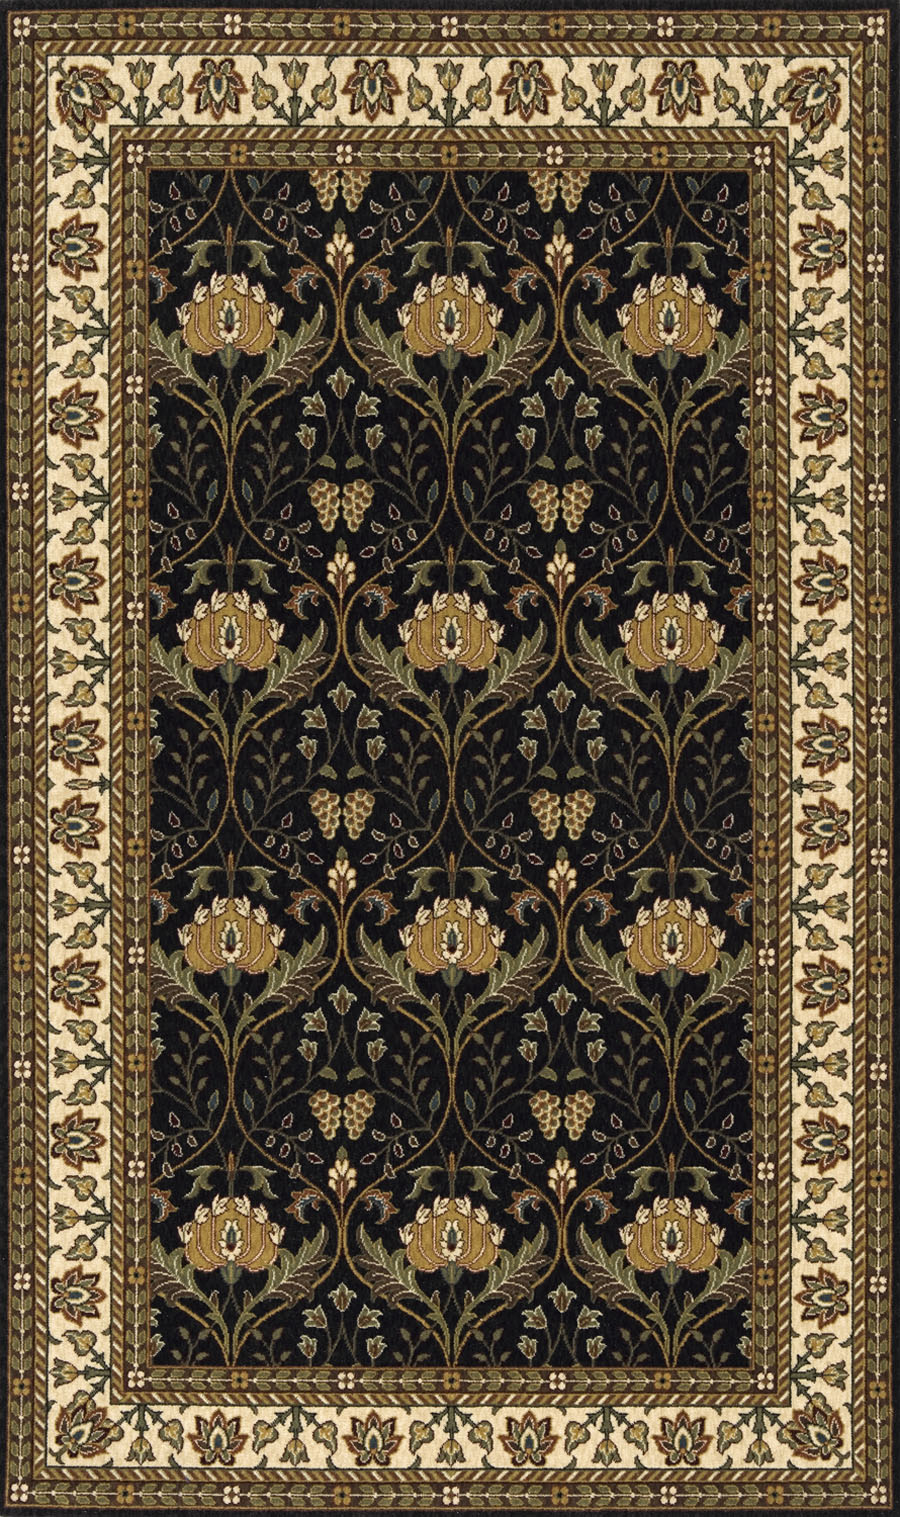 Momeni persian garden pg 12 charcoal rug for Momeni rugs